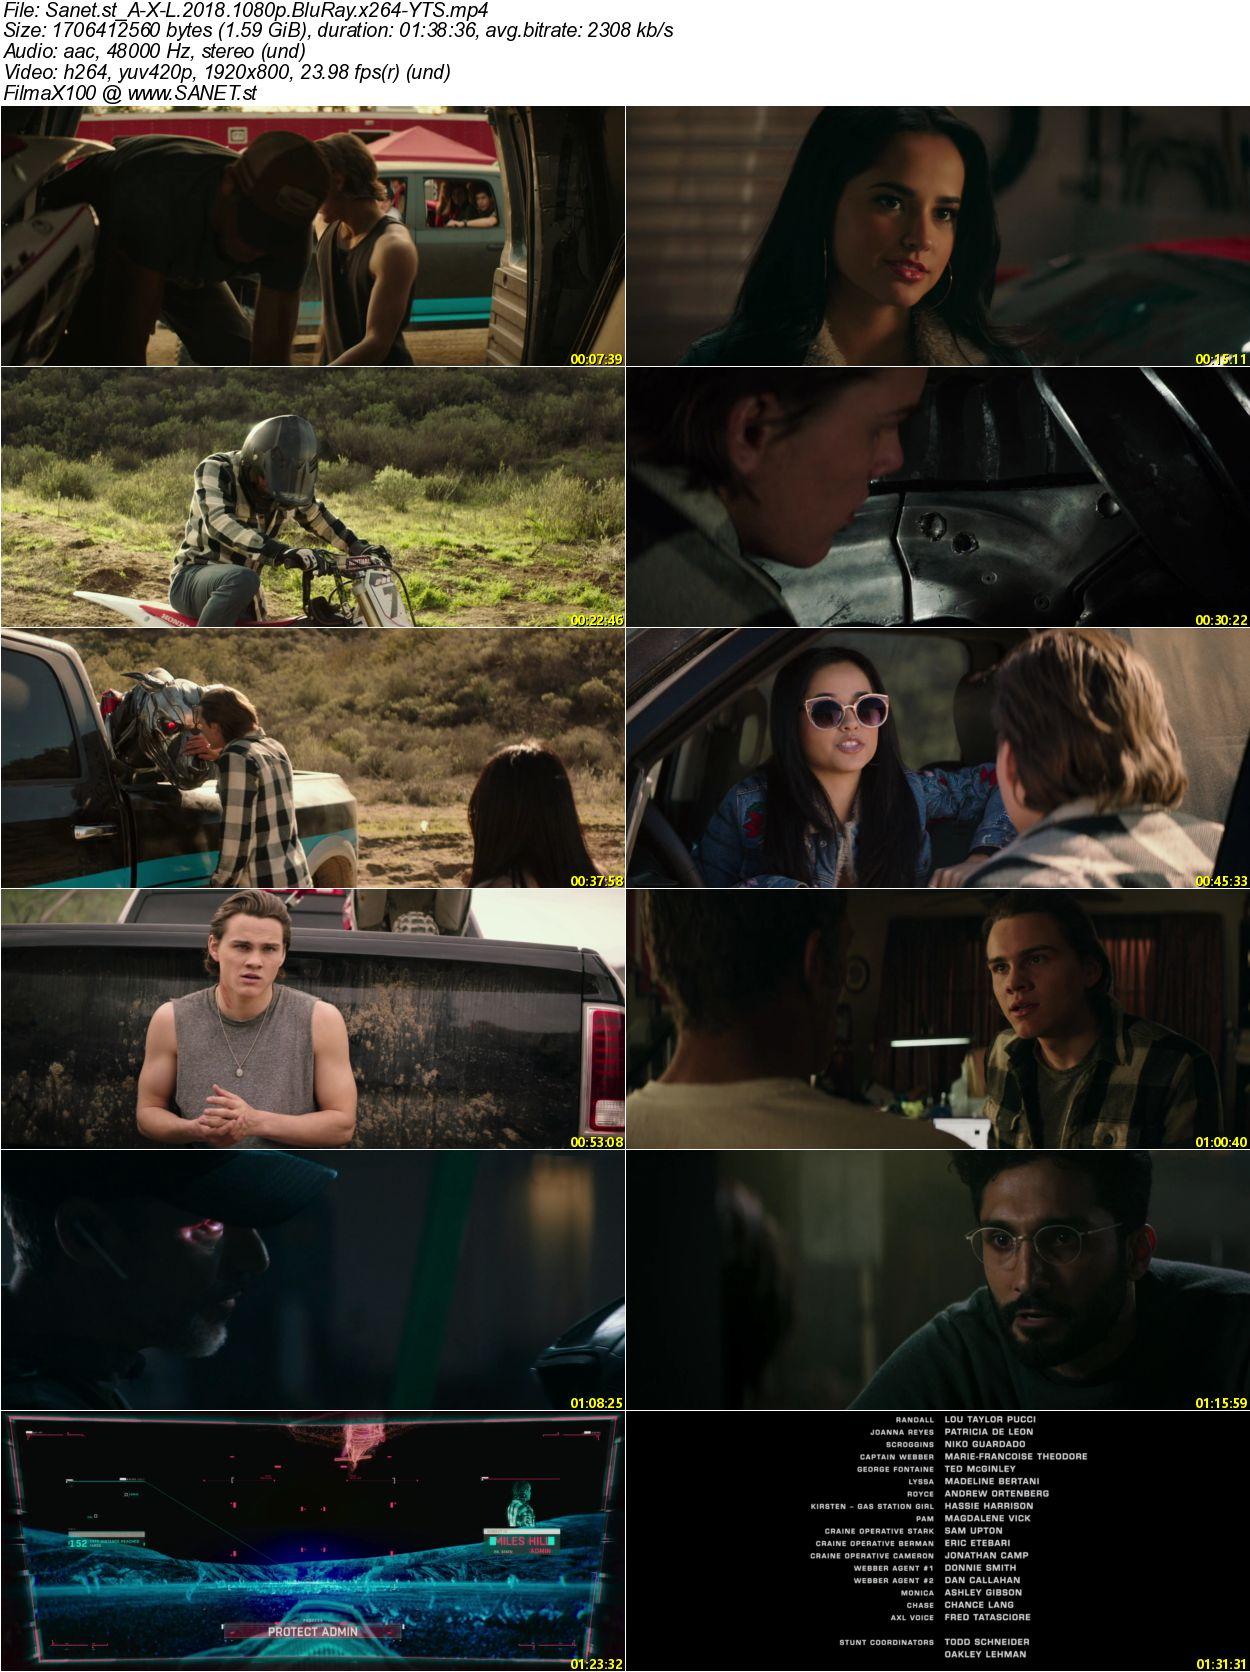 Axl Movie 2018 download a-x-l 2018 1080p bluray x264-yts - softarchive